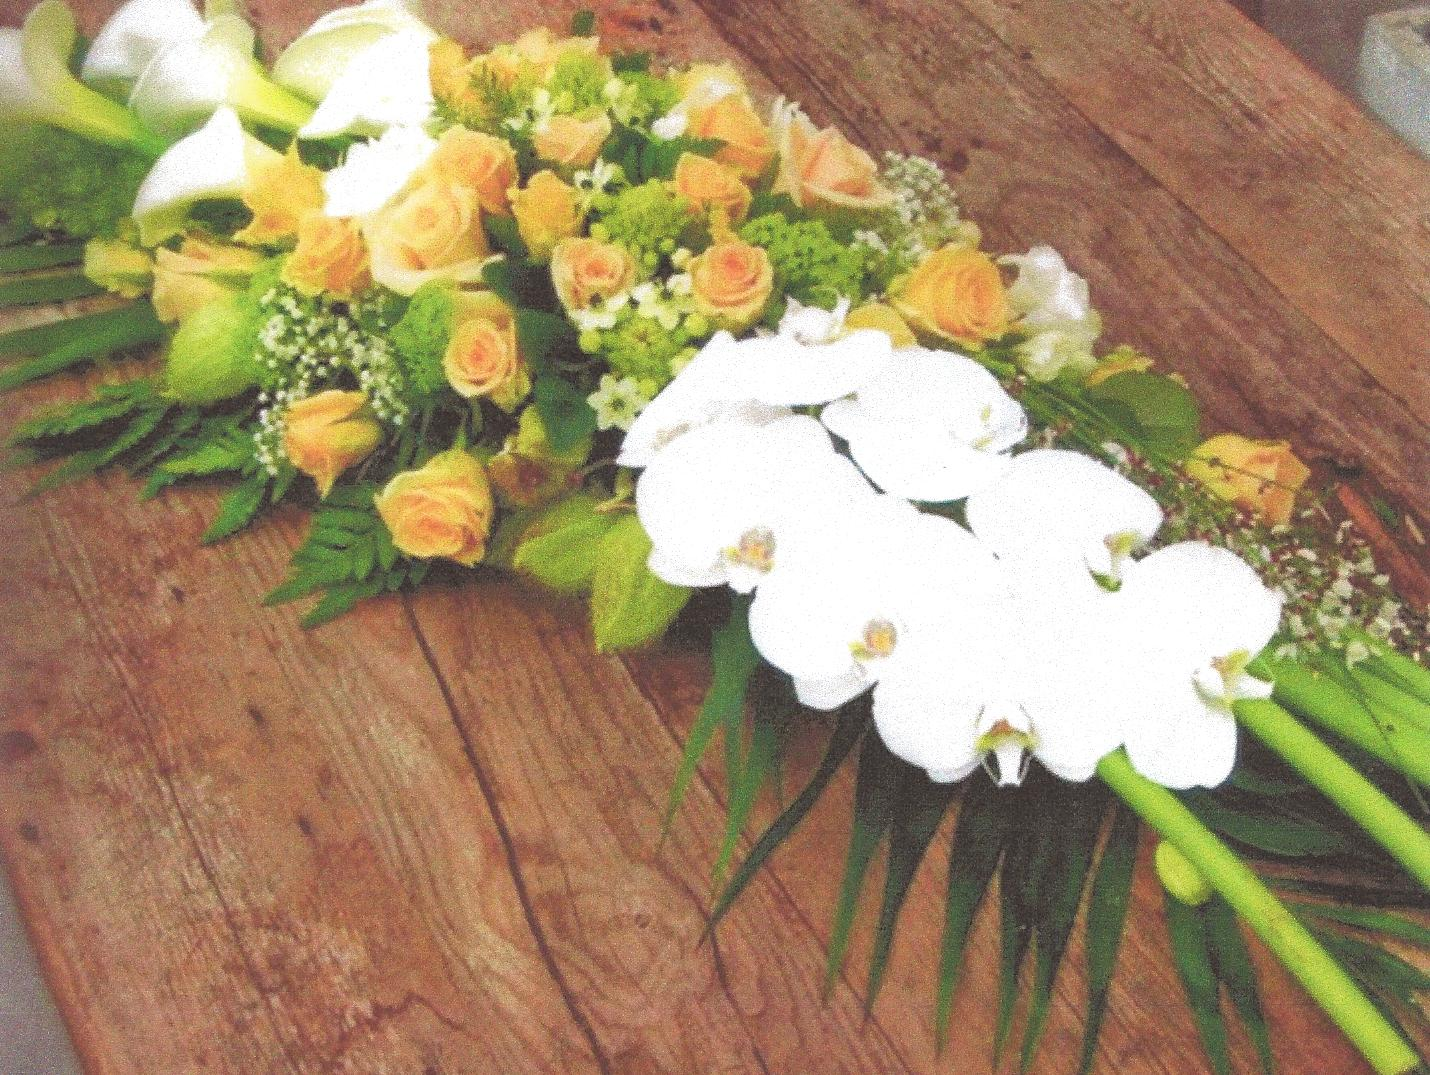 NR 19 bloemstuk arondskelken rozen en seizoensvulling 120 euro